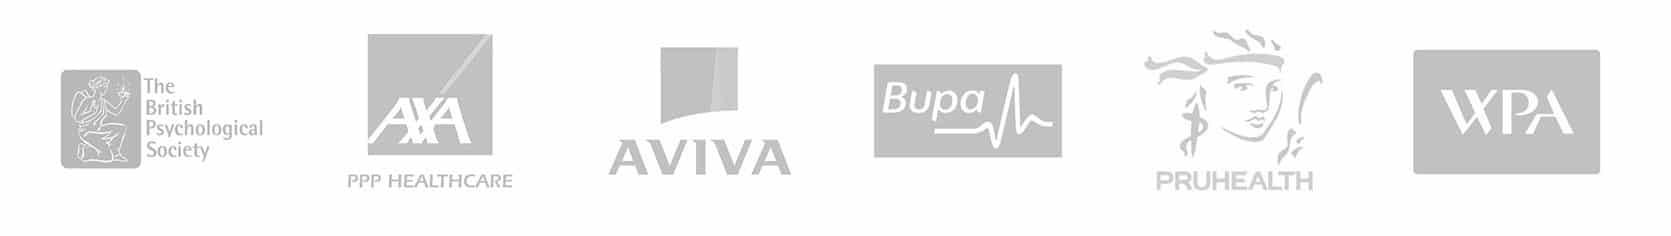 psychology Insurance logos